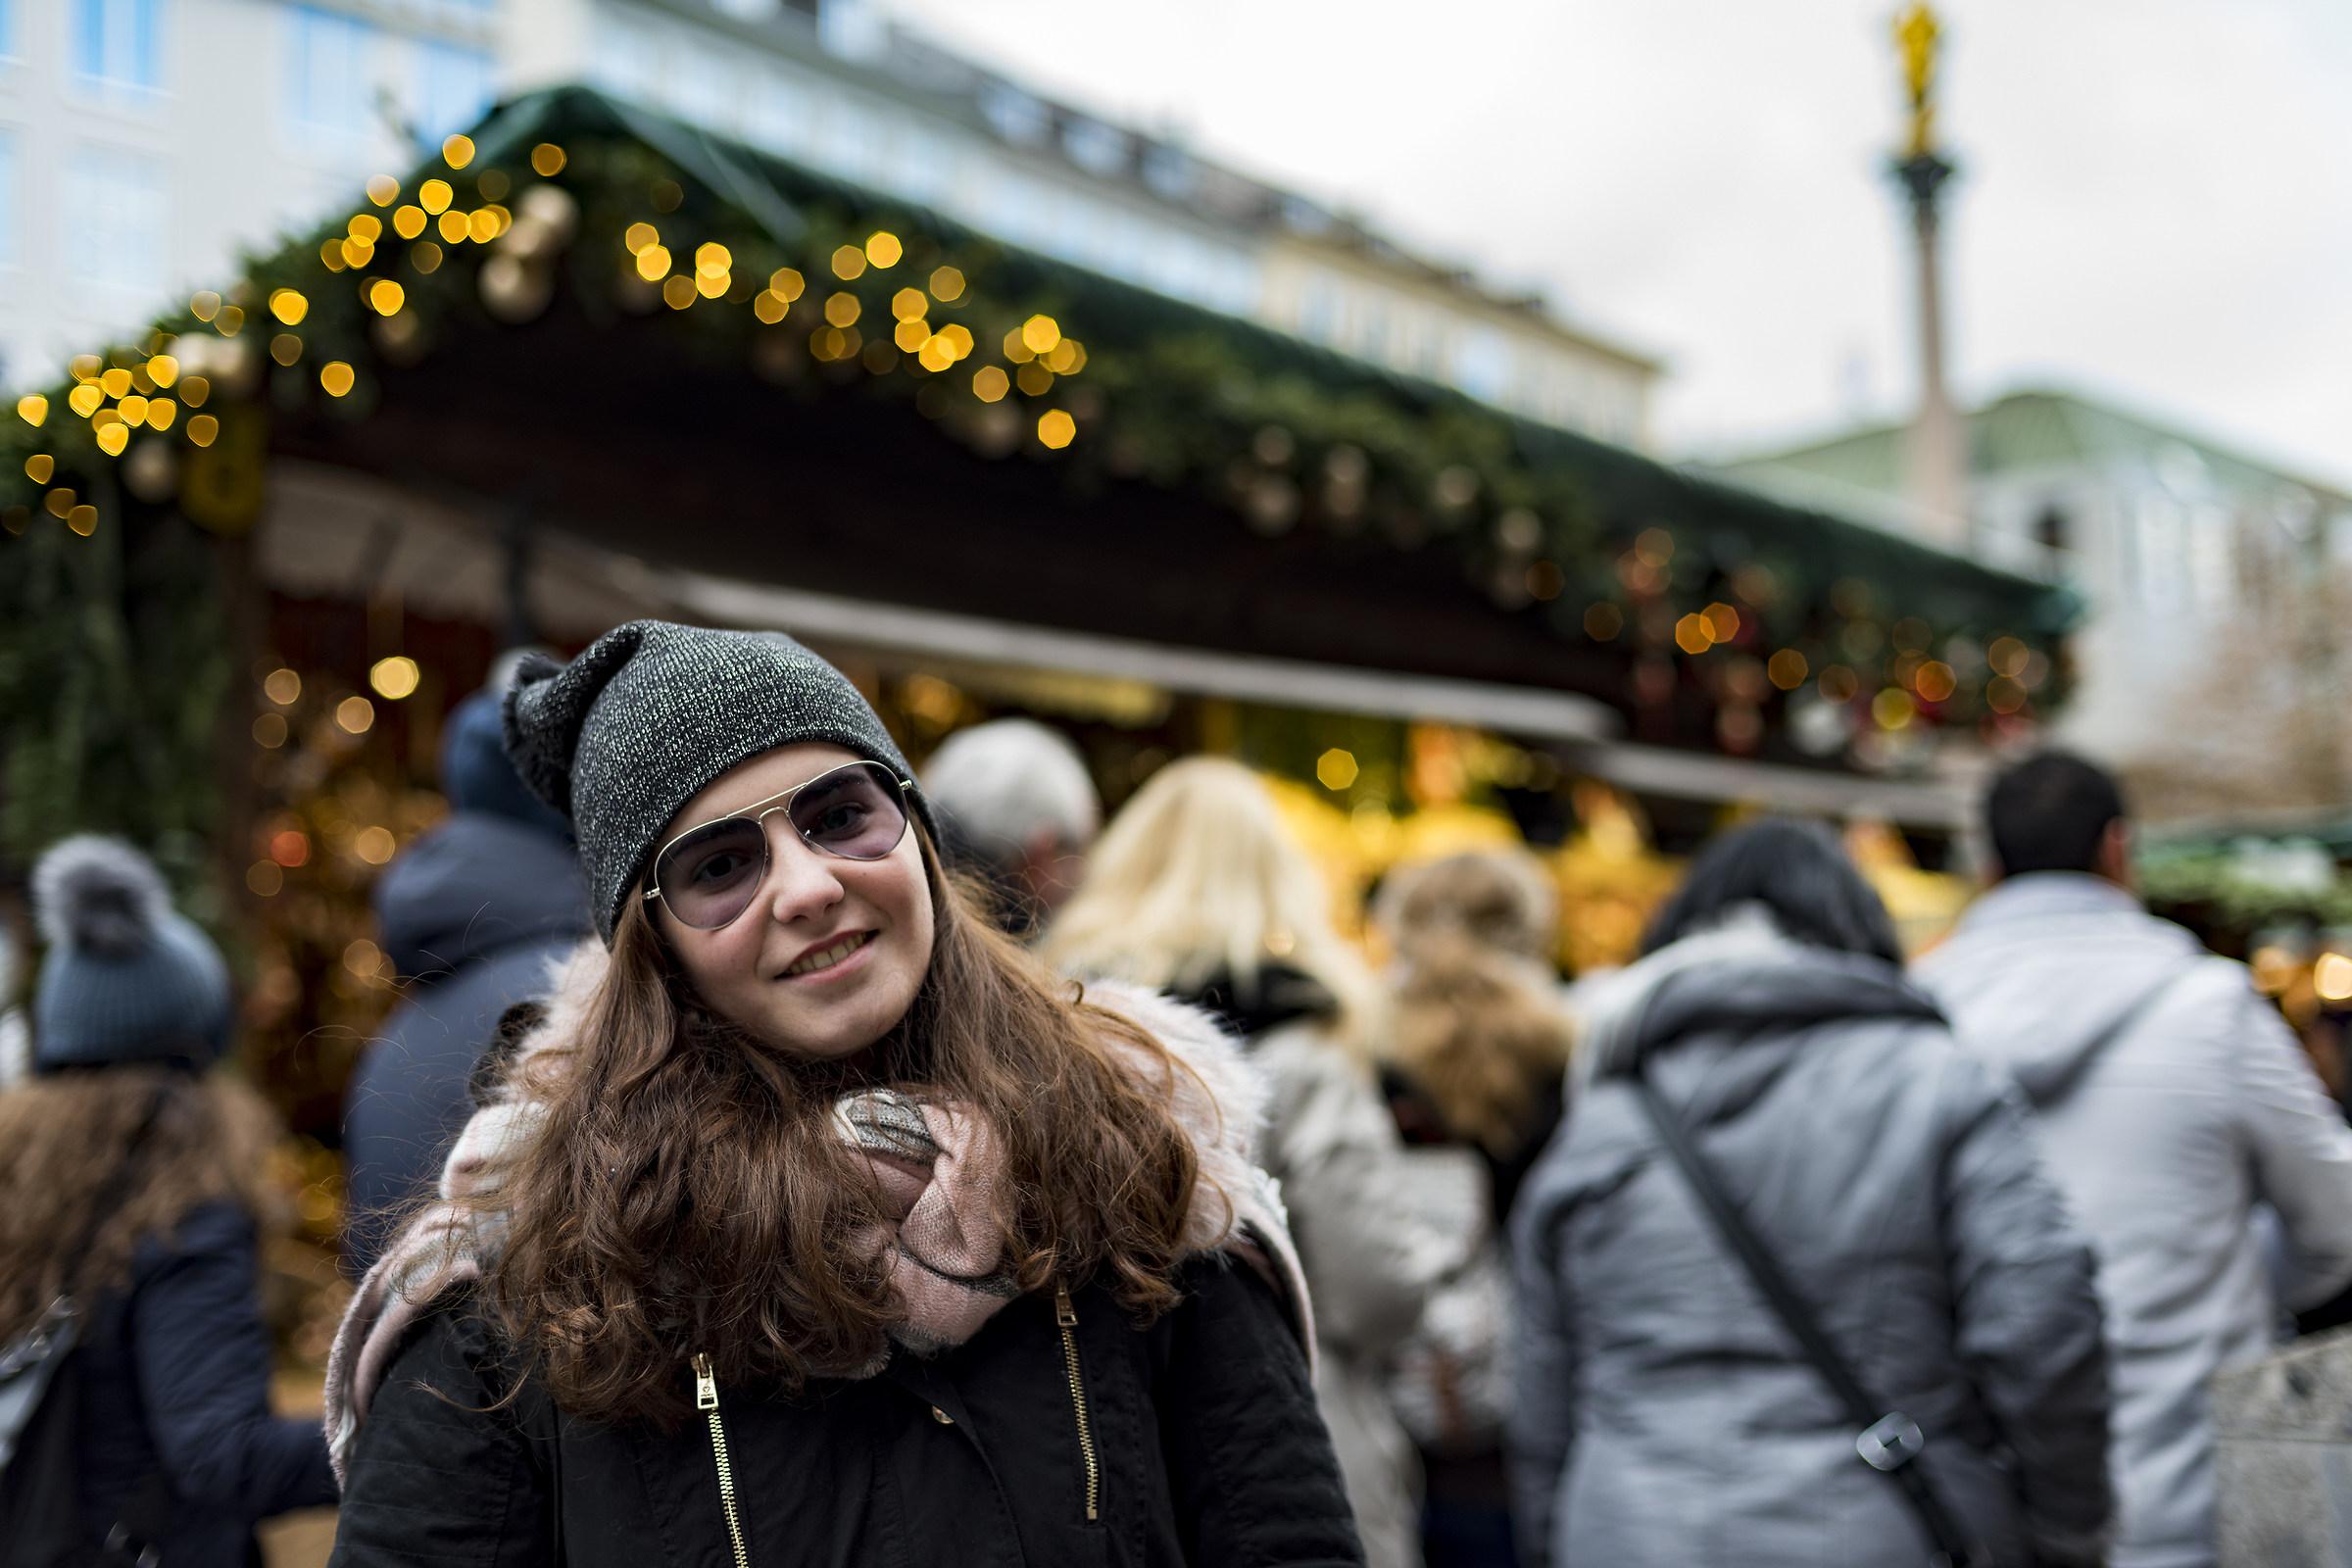 Celeste, München Marienplatz Dec 2017...